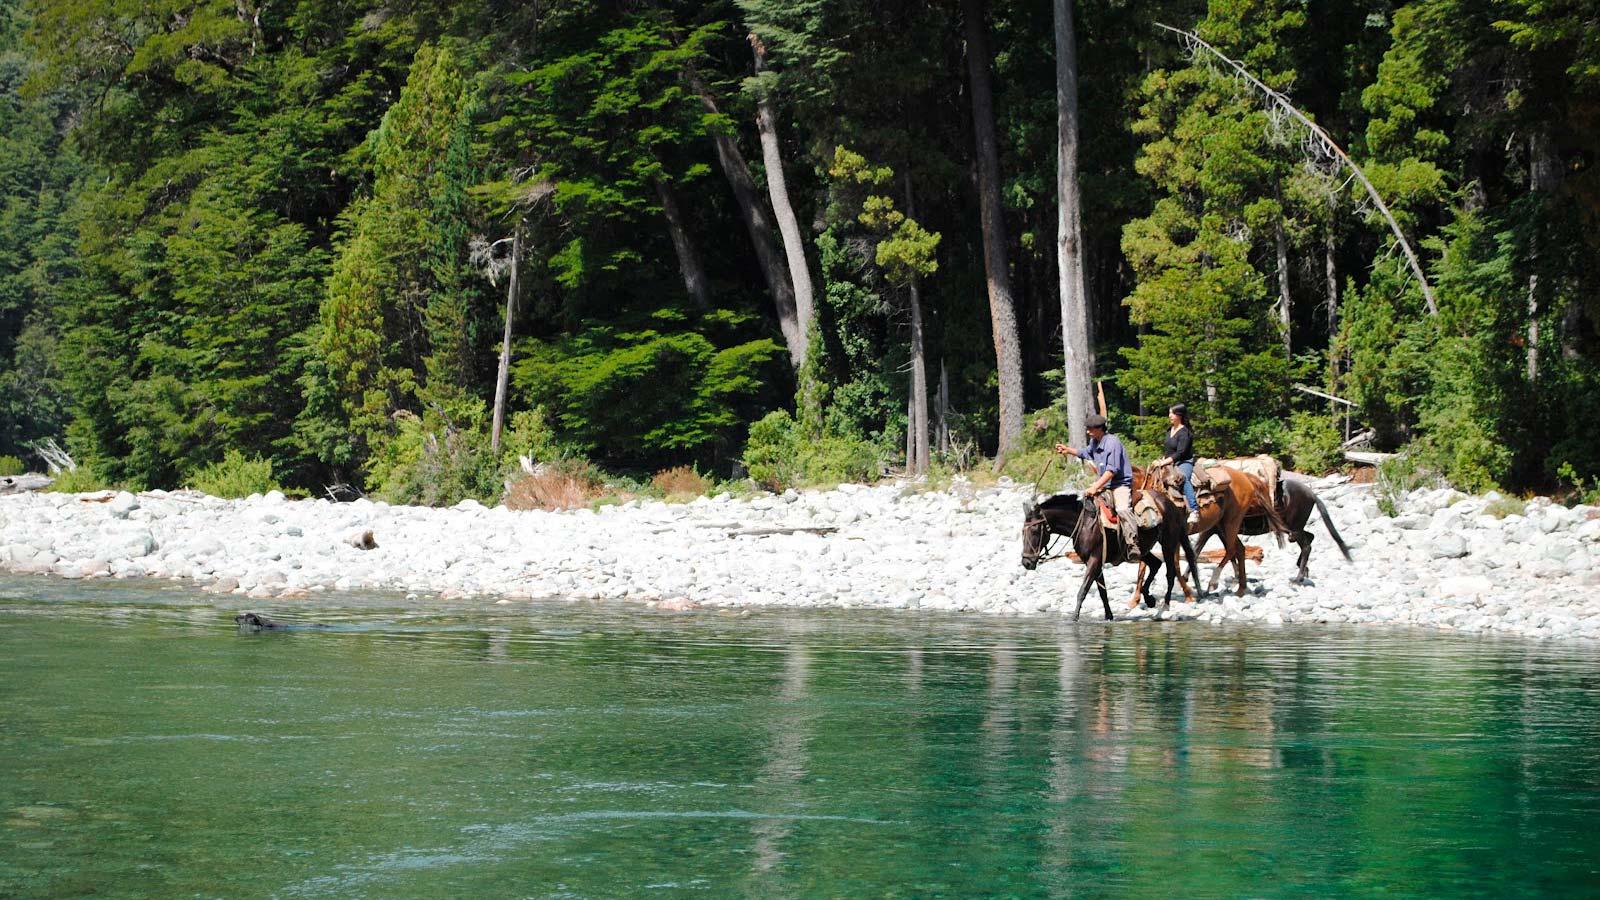 Horse riding in Patagonia - Rio Azul river excursion